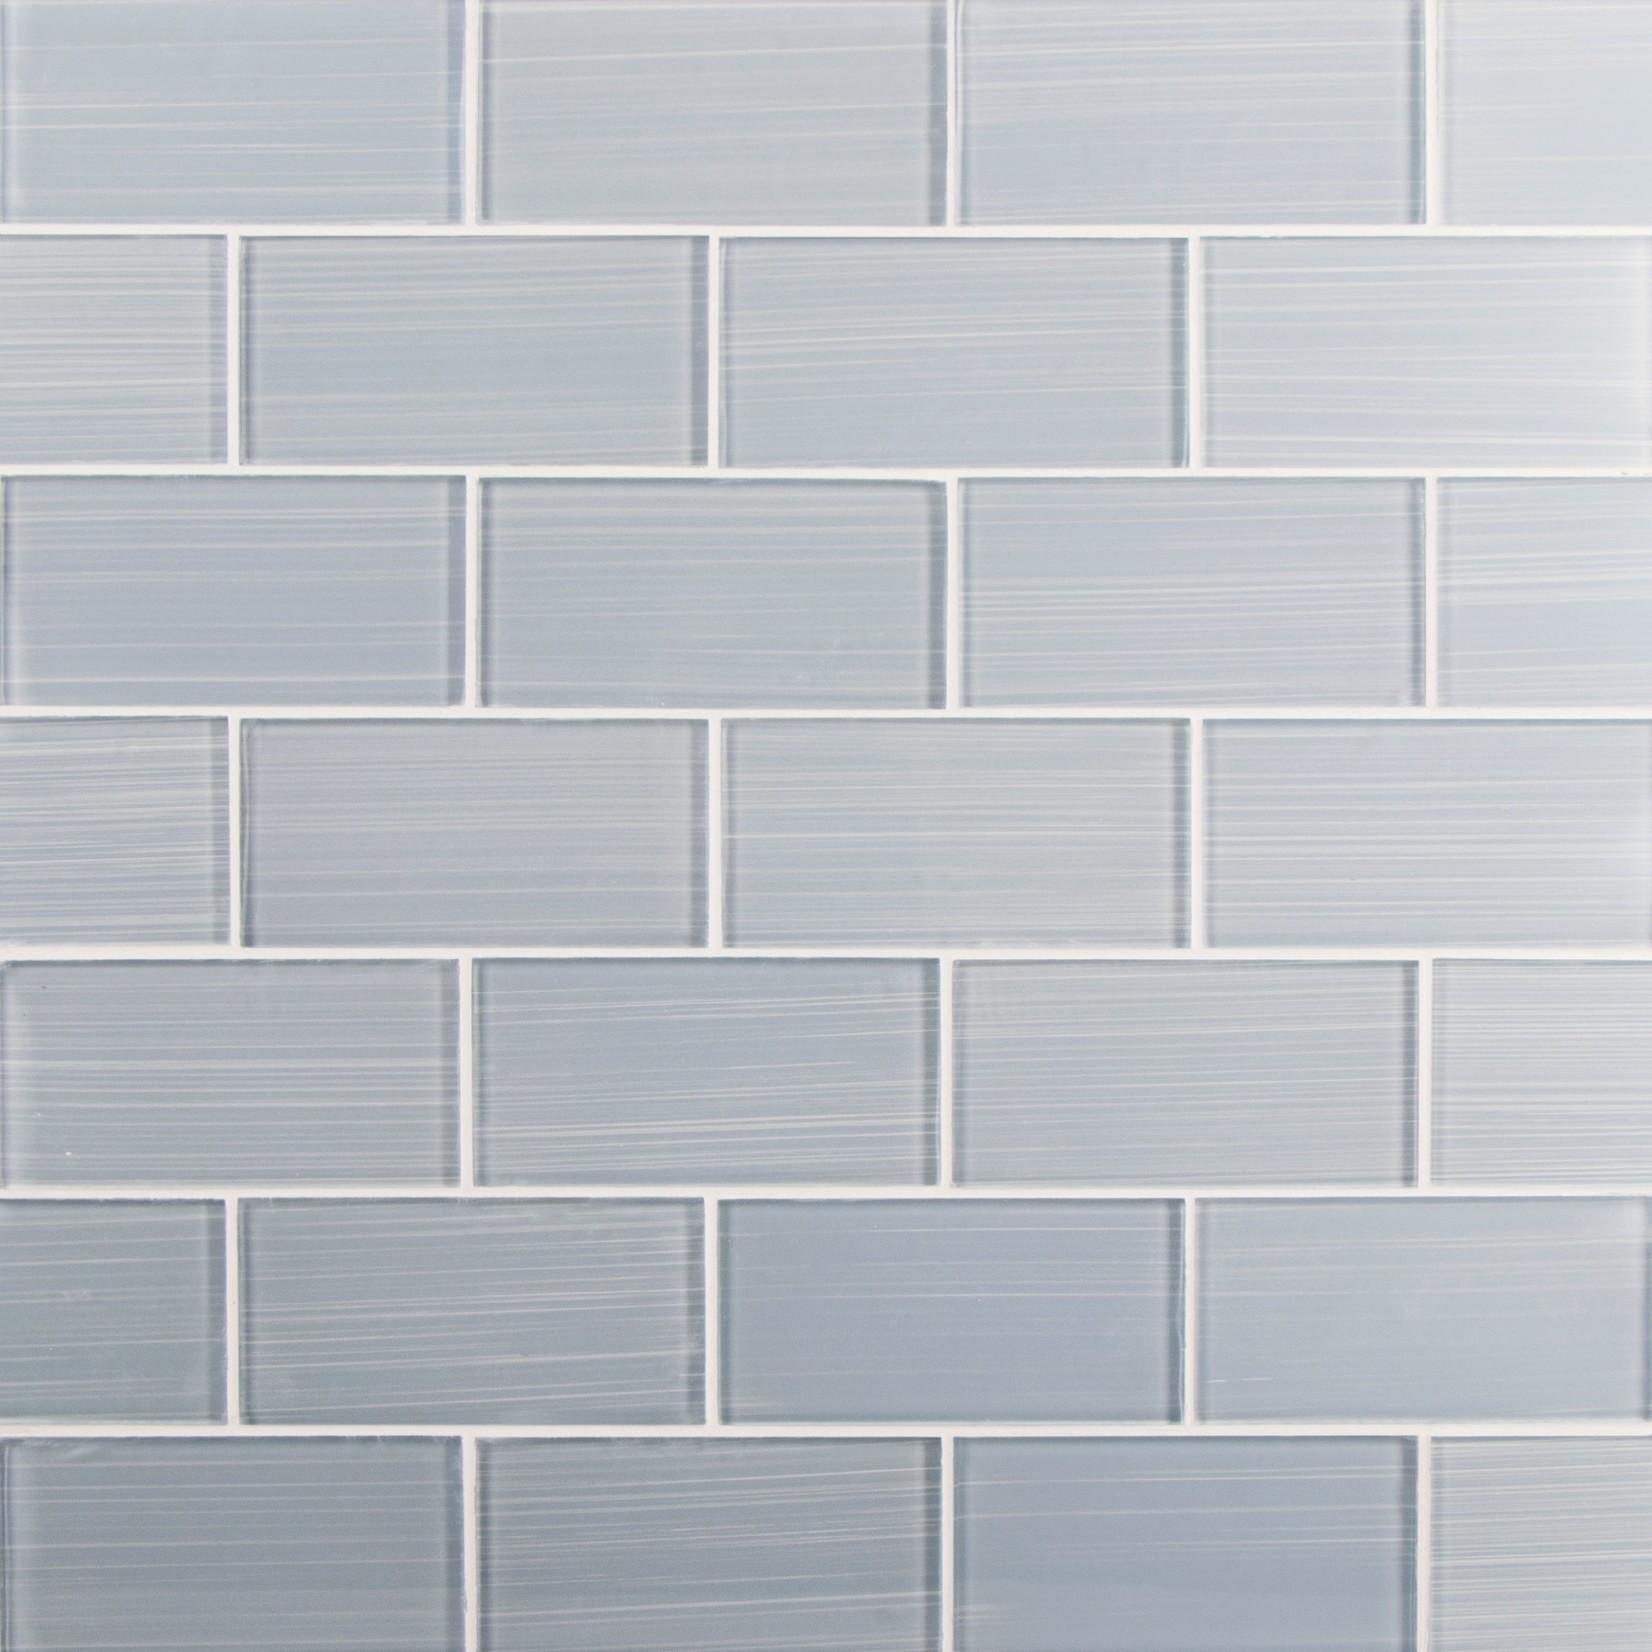 "*Premium Hand Painted 3"" x 6"" Glass Subway Tile - Mesh Back - Soft Gray"